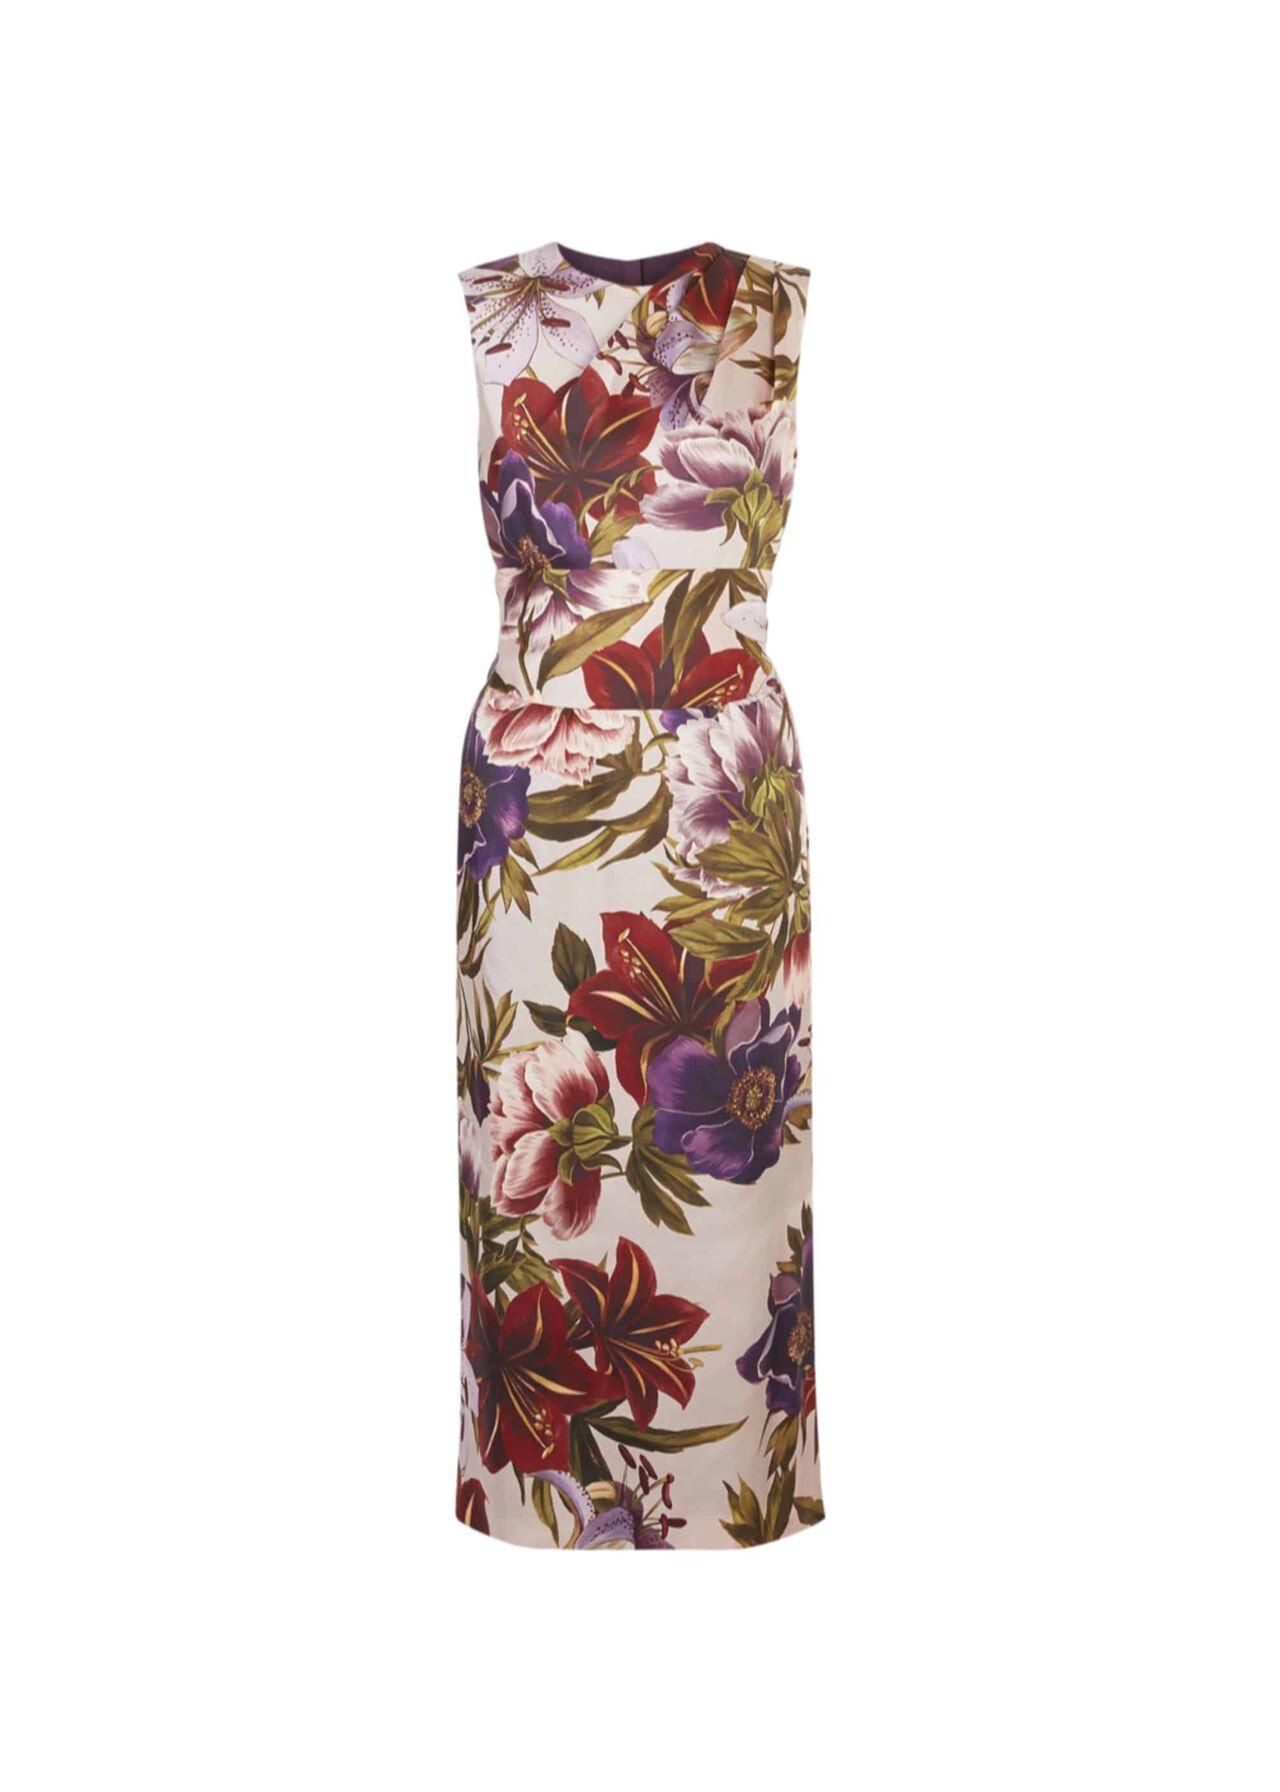 Thao Floral Dress Blush Multi